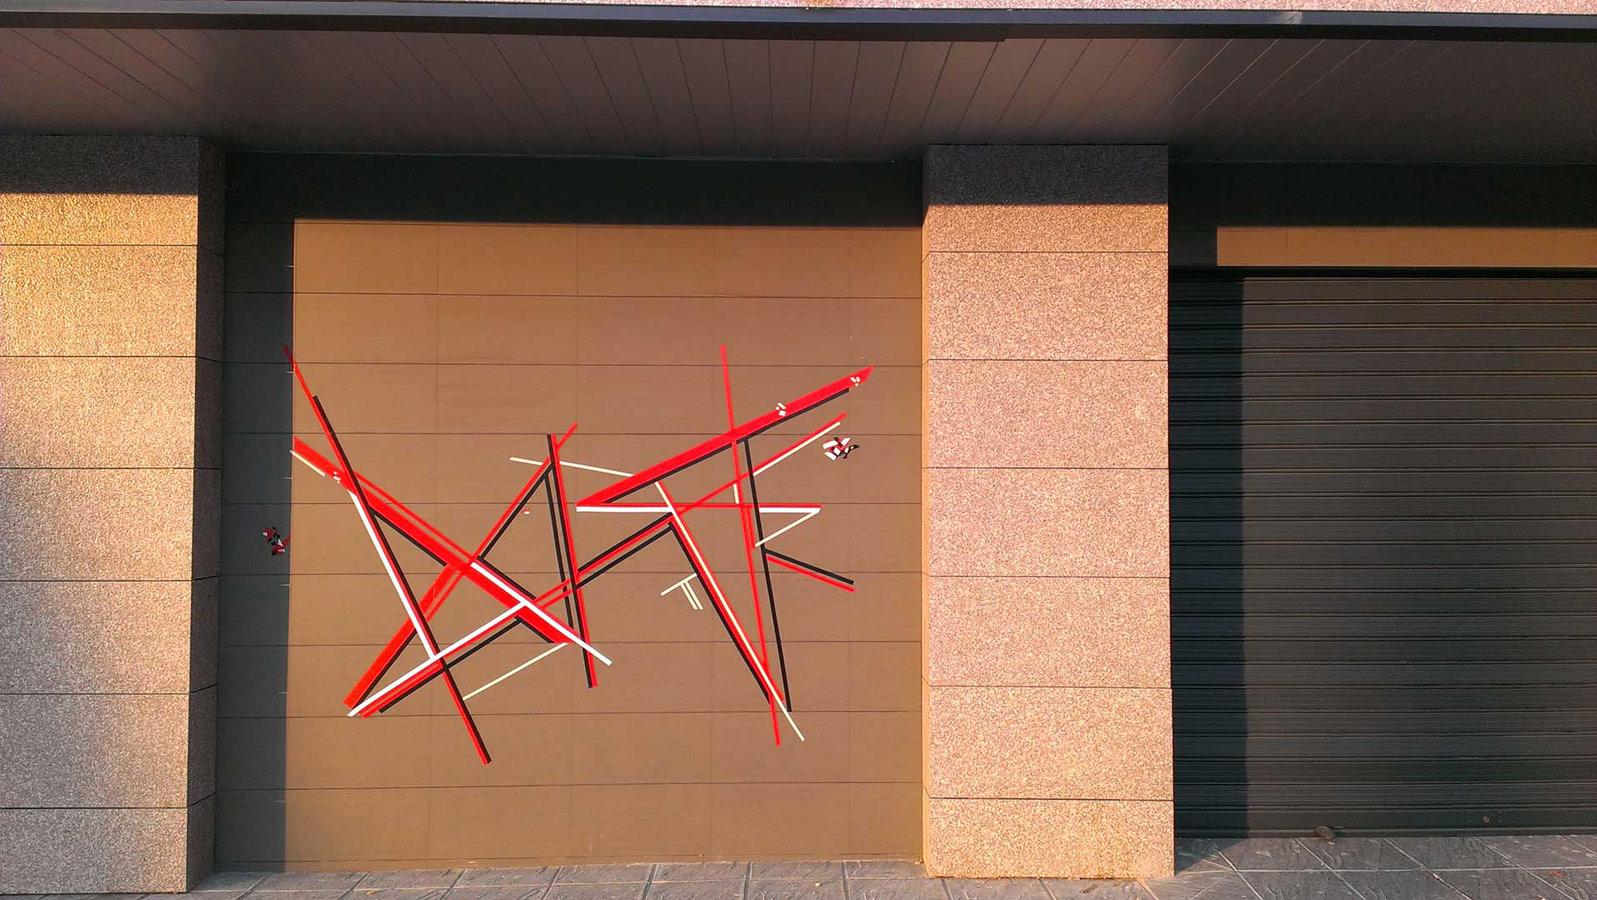 ec13-new-murals-granada-spain-06